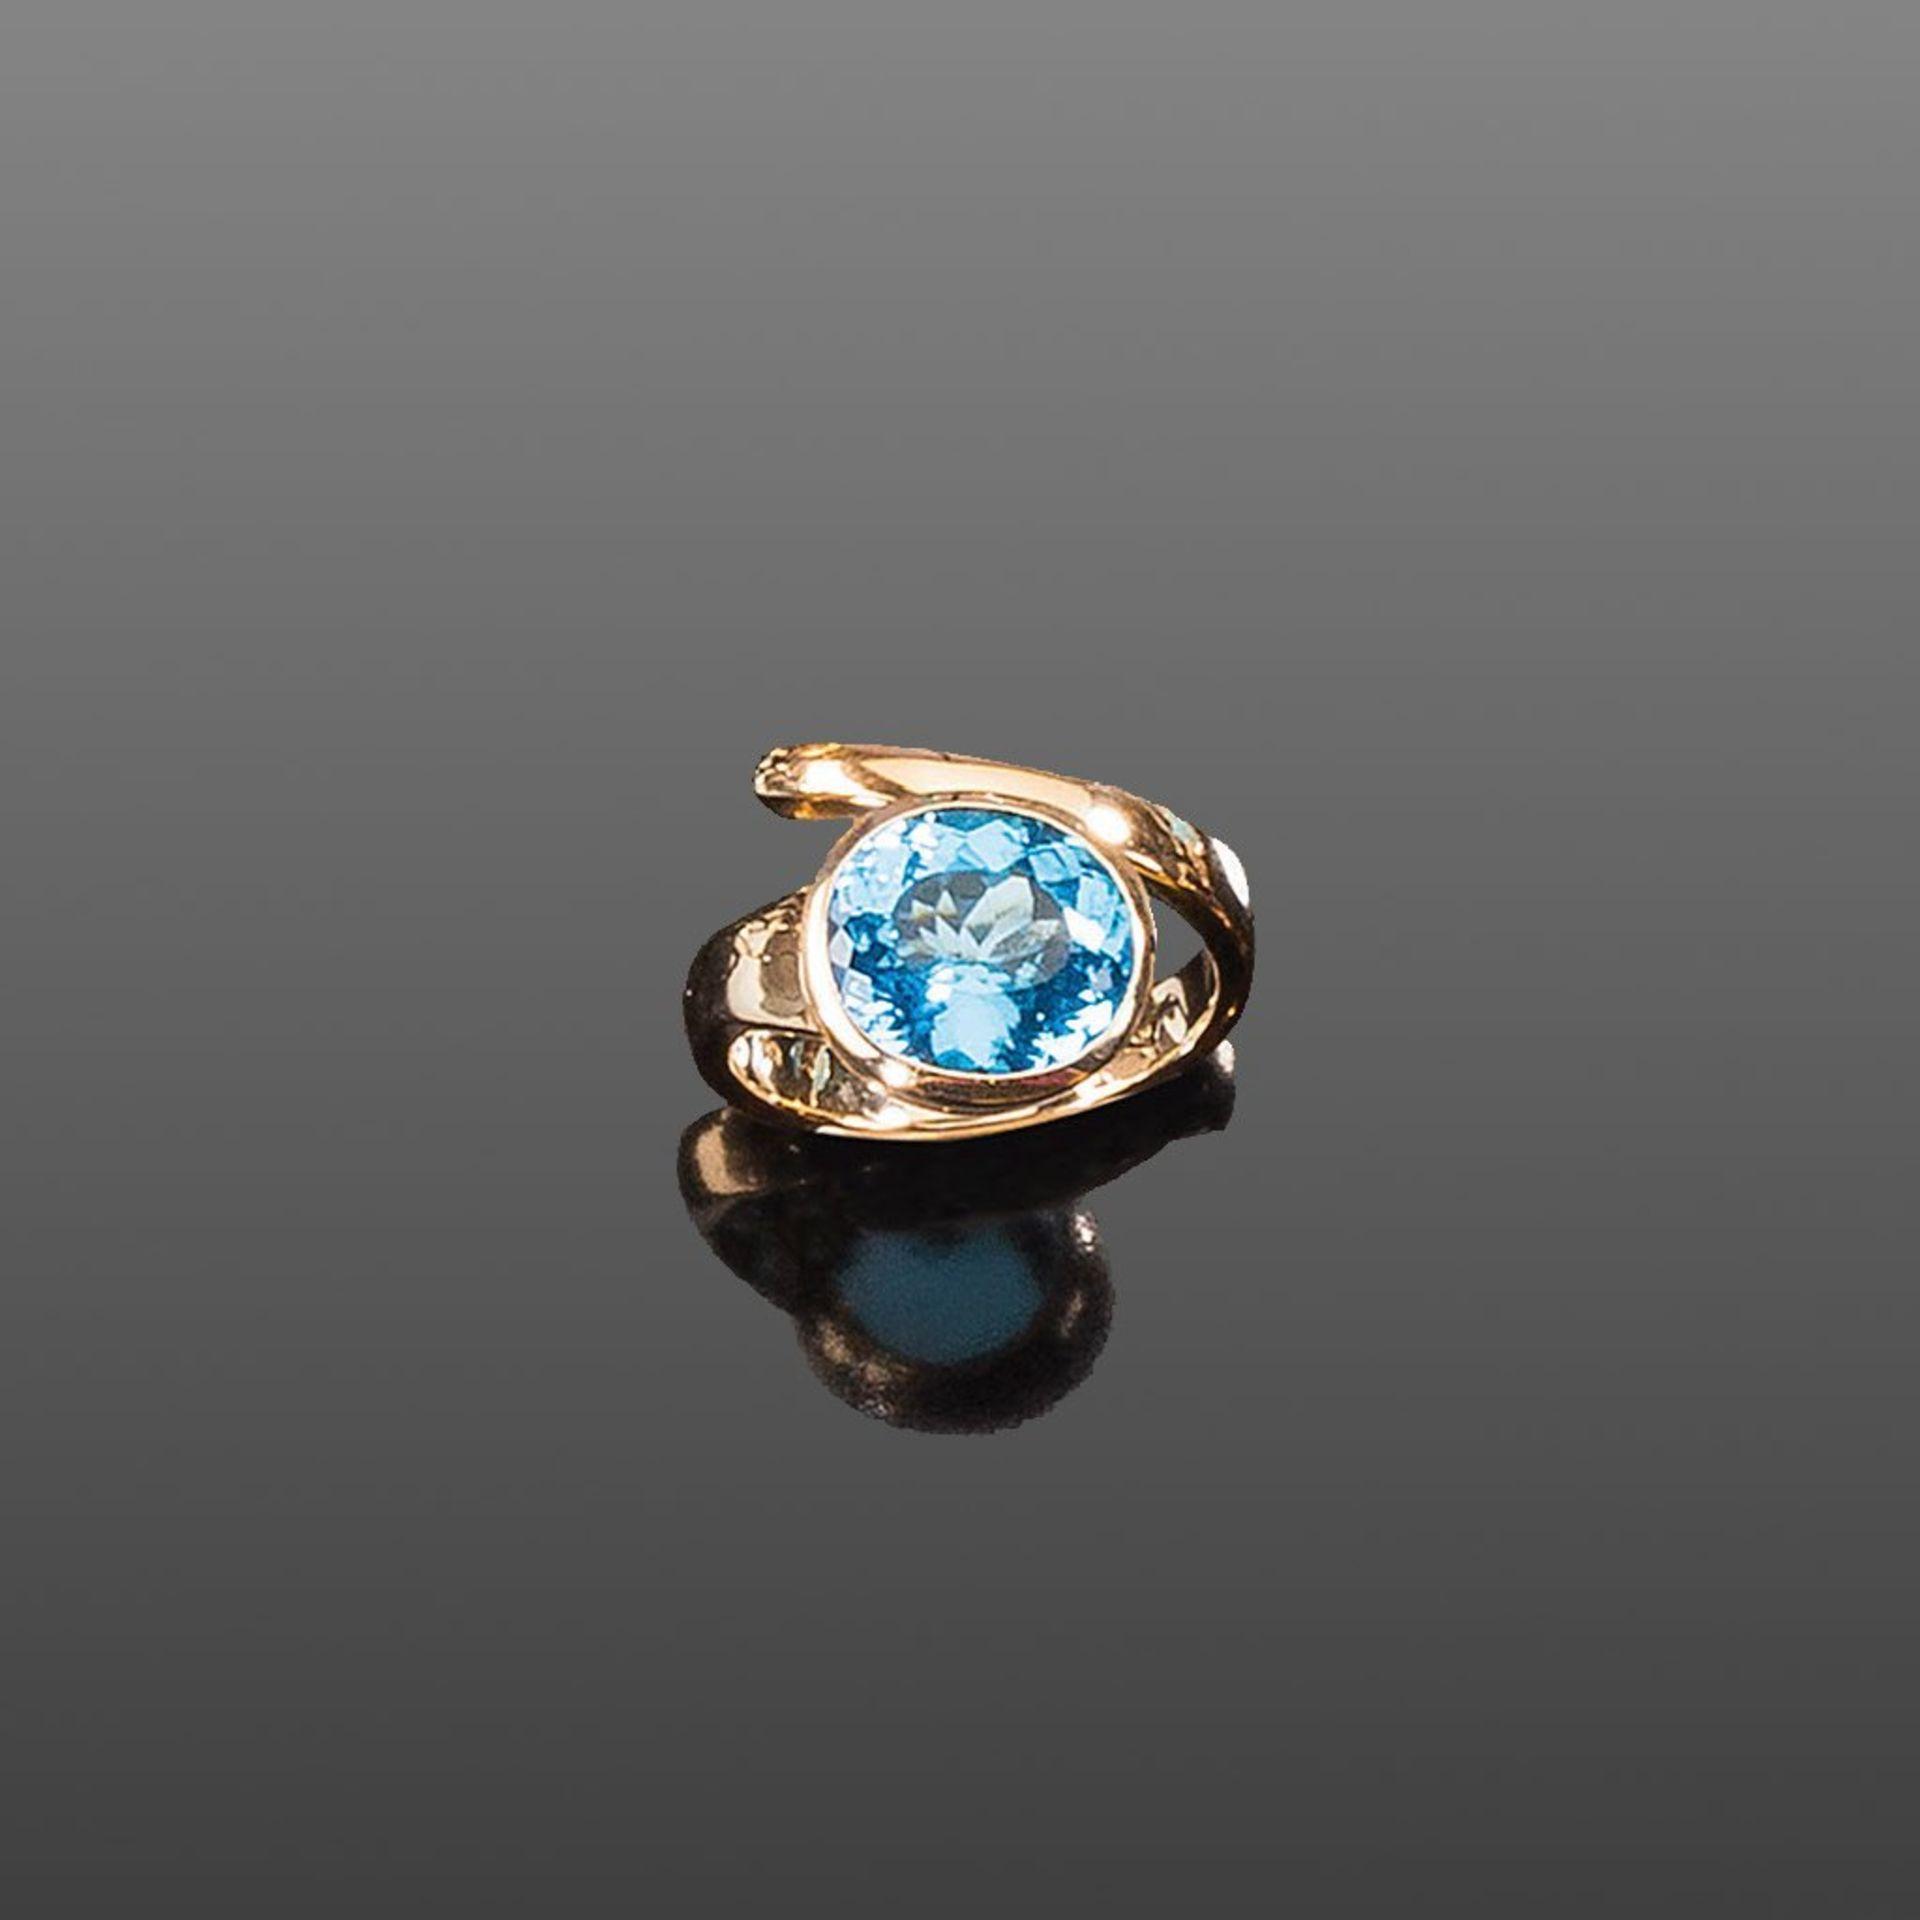 Blautopasring. Ovaler Blautopas ca. 5,75 ct. Fassung 14 ct. Roségold